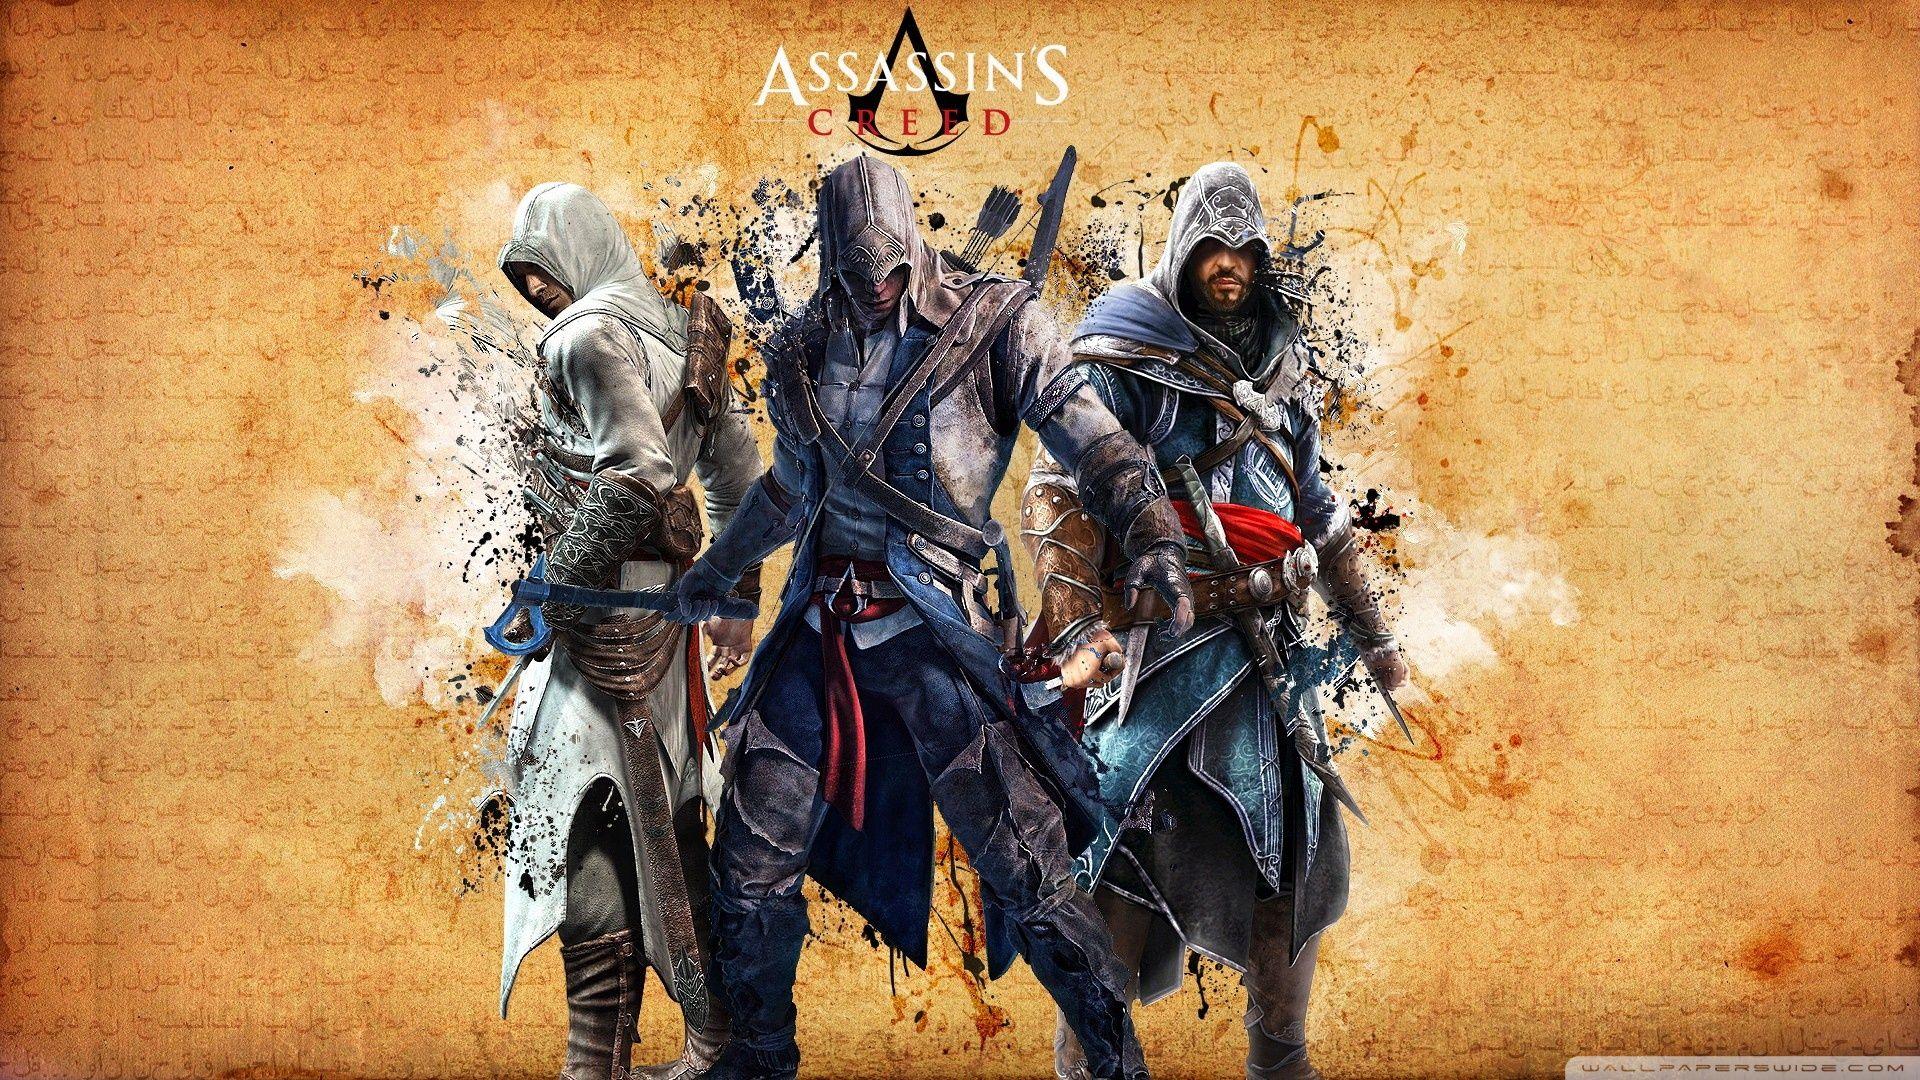 Assassins creed hd desktop wallpapers for hd wallpapers assassins creed 3 ancestors left to right altair connor ezio voltagebd Gallery